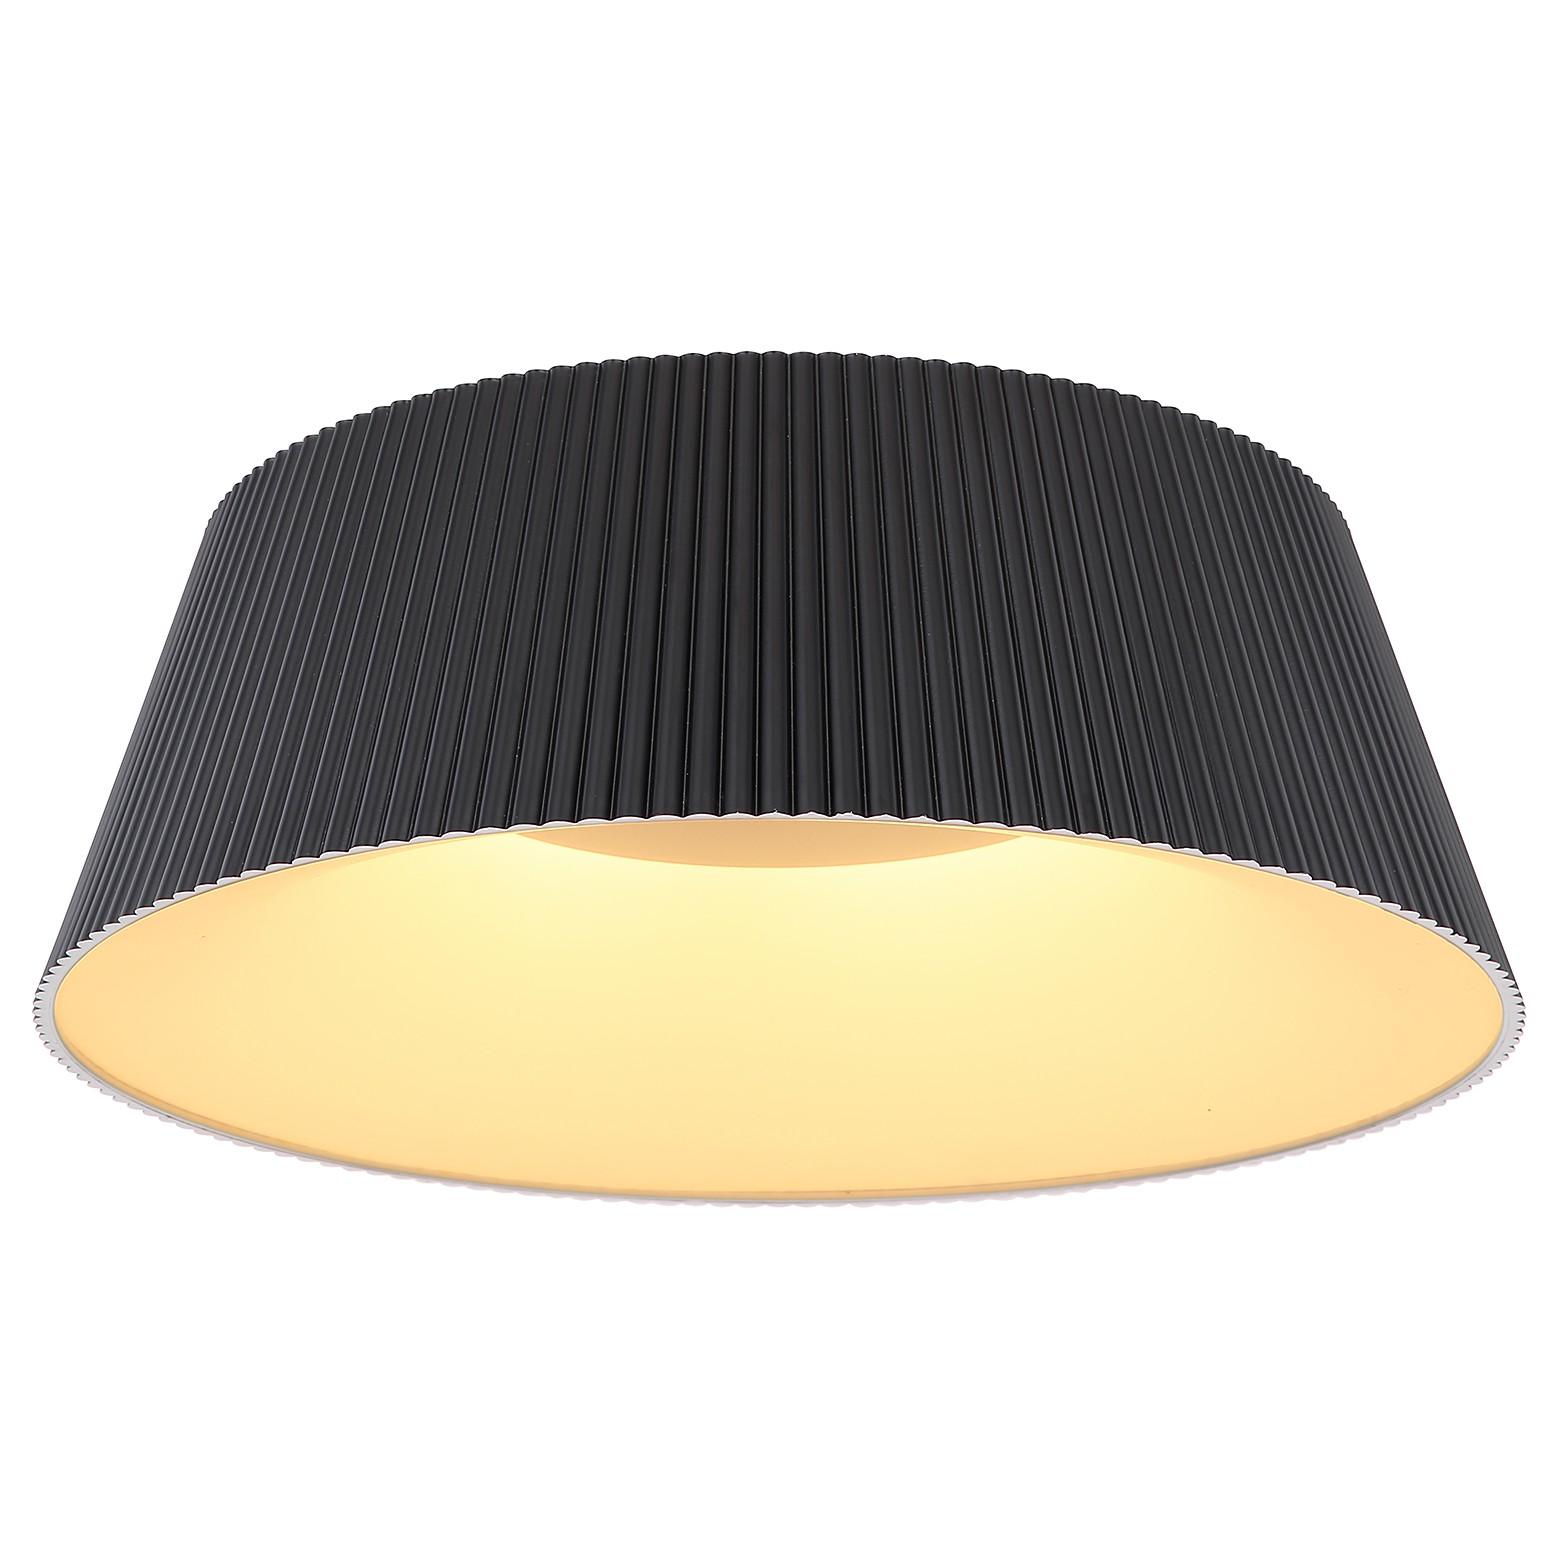 home24 LED-Deckenleuchte Crotone